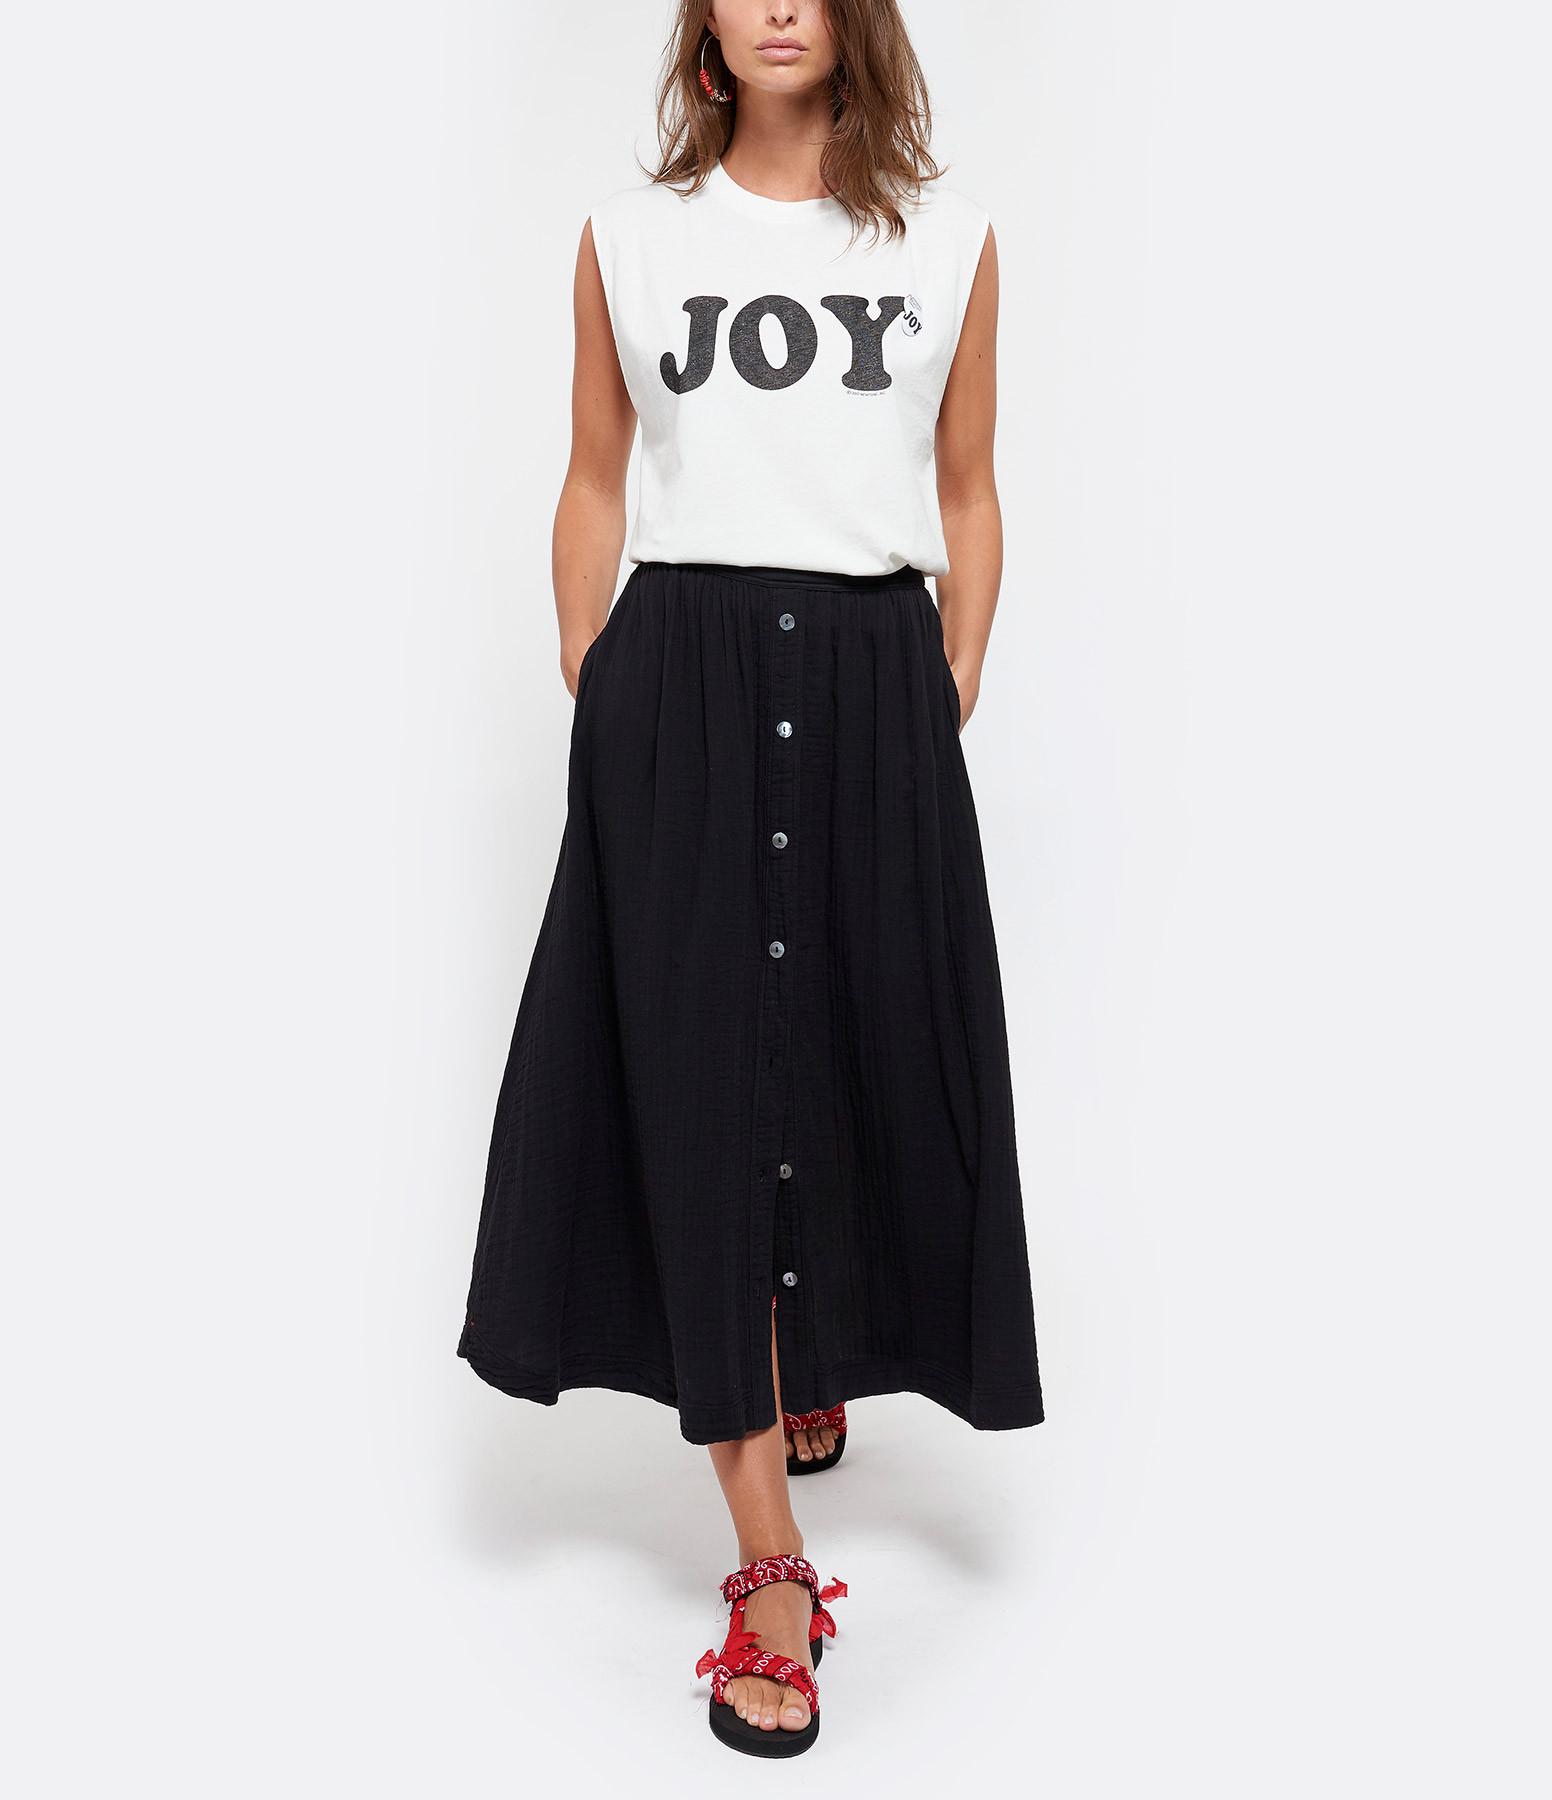 NEWTONE - Tee-shirt Biker Joy Coton Ecru